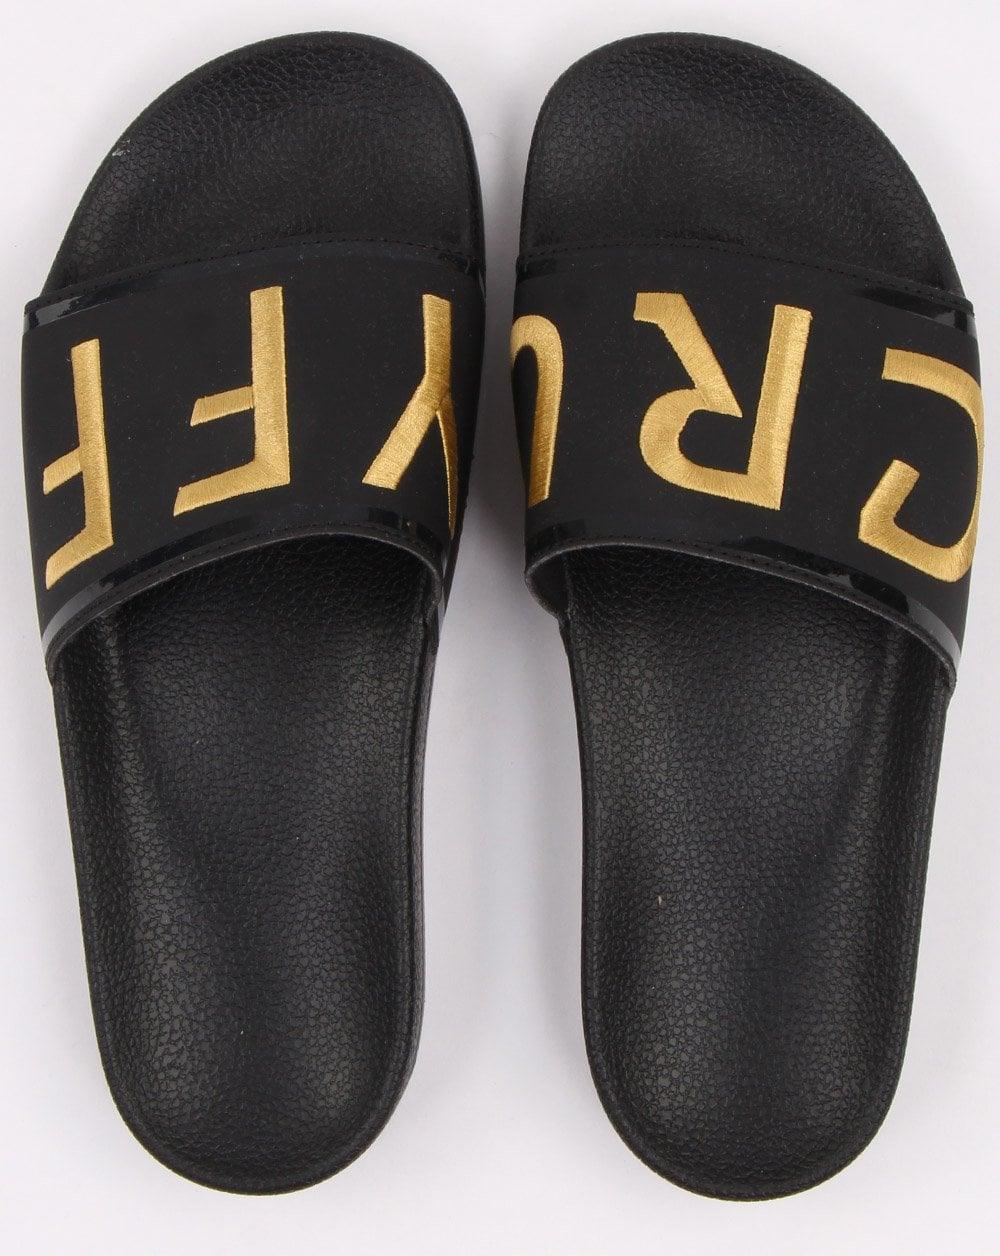 627558c5bca Cruyff Copa Sliders in Black and Gold